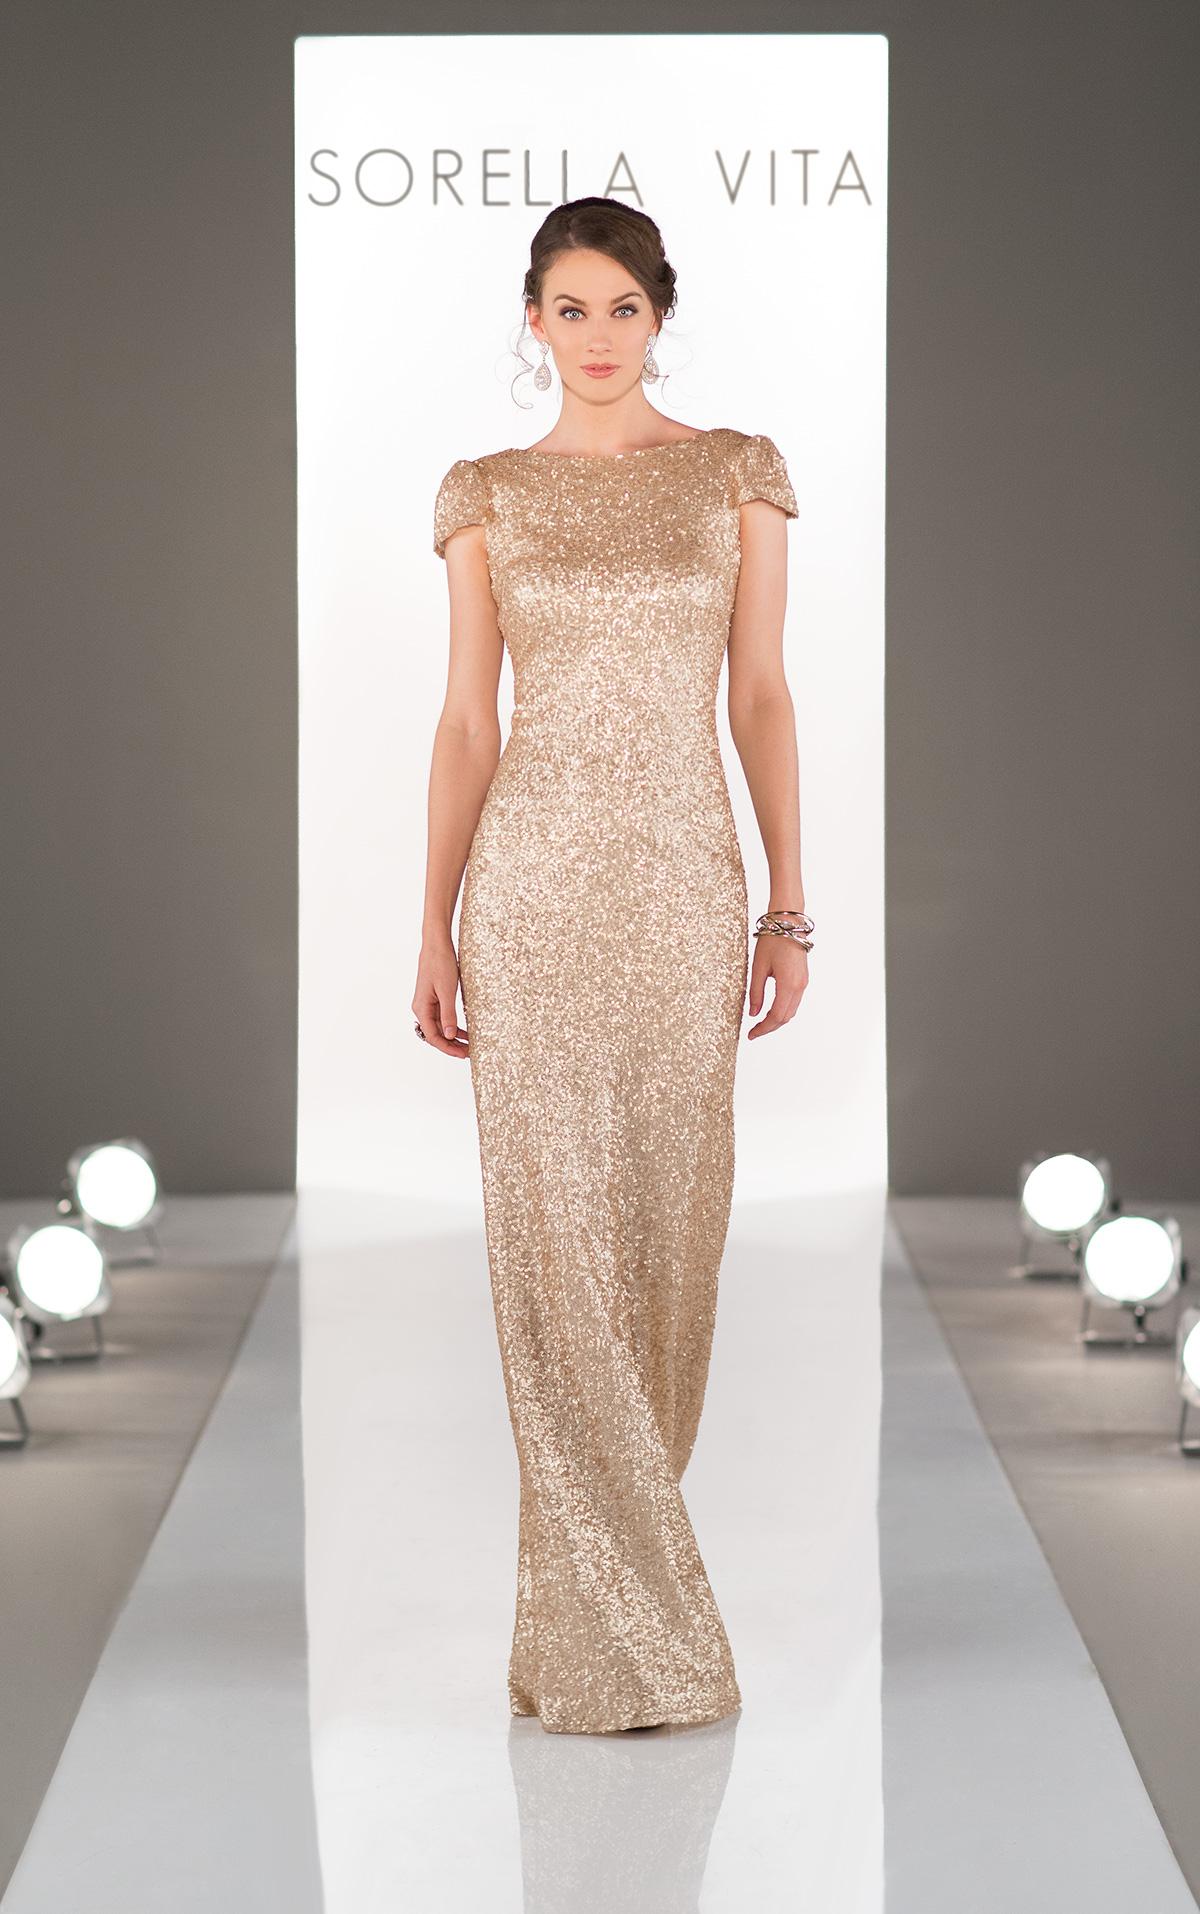 Sorella vita 8718 gold bridesmaid dress 279 for Metallic bridesmaid dresses wedding